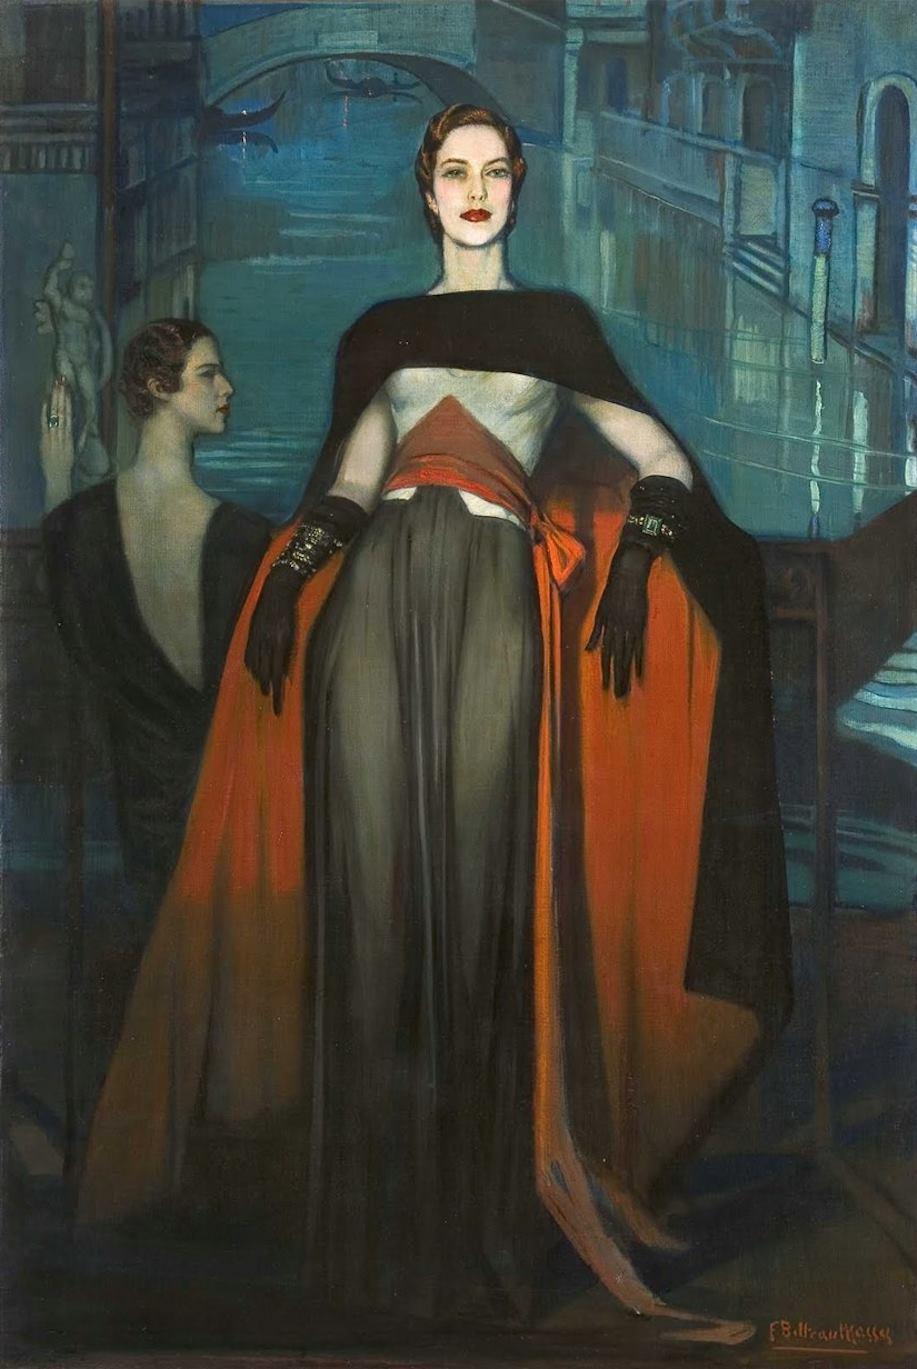 Madame Bonnardel, Countess de Montgomery, 1934